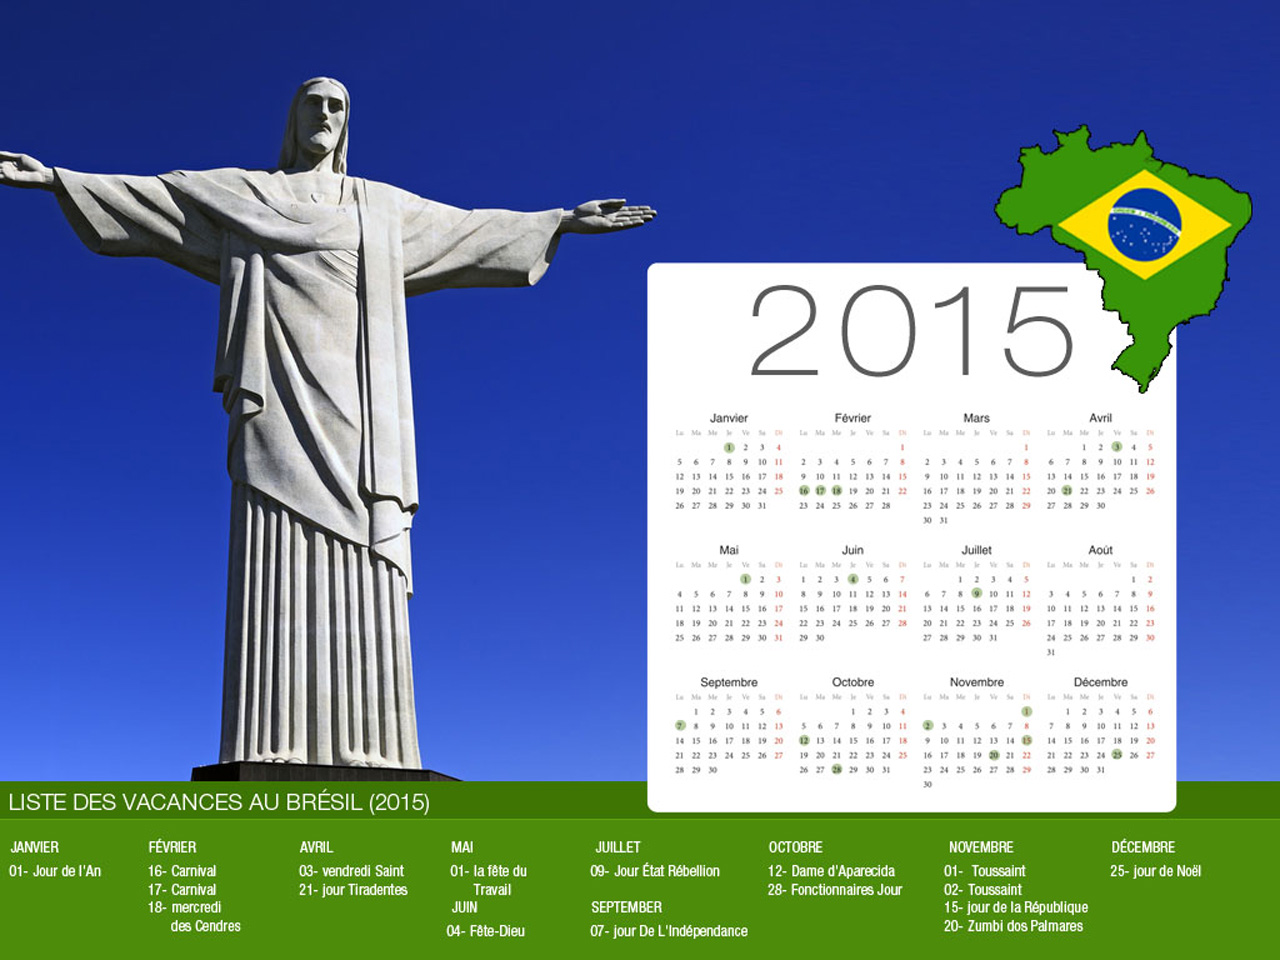 Brazil Holiday Calendar